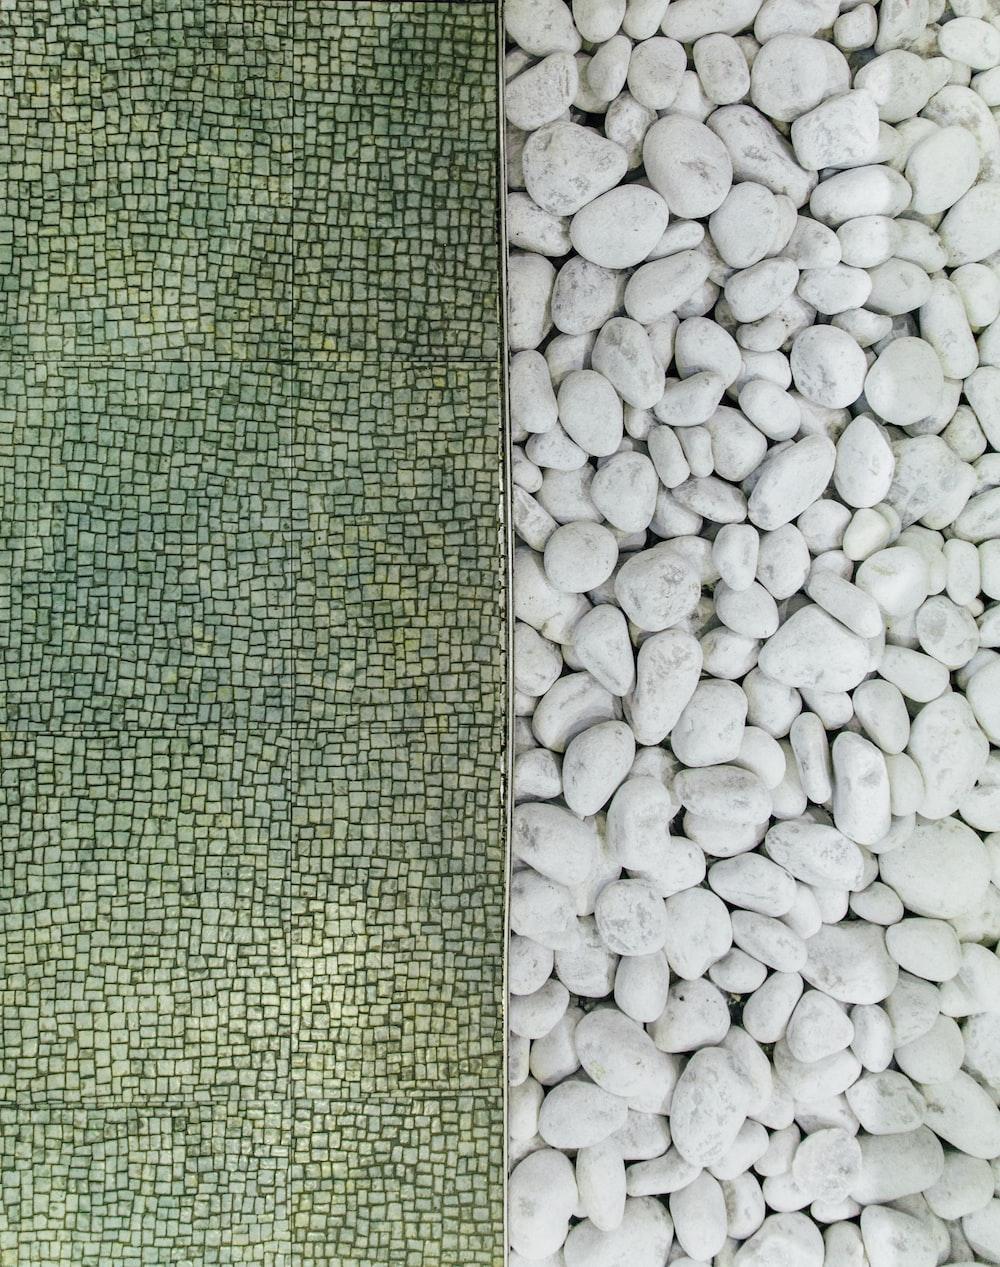 white pebble lot collage